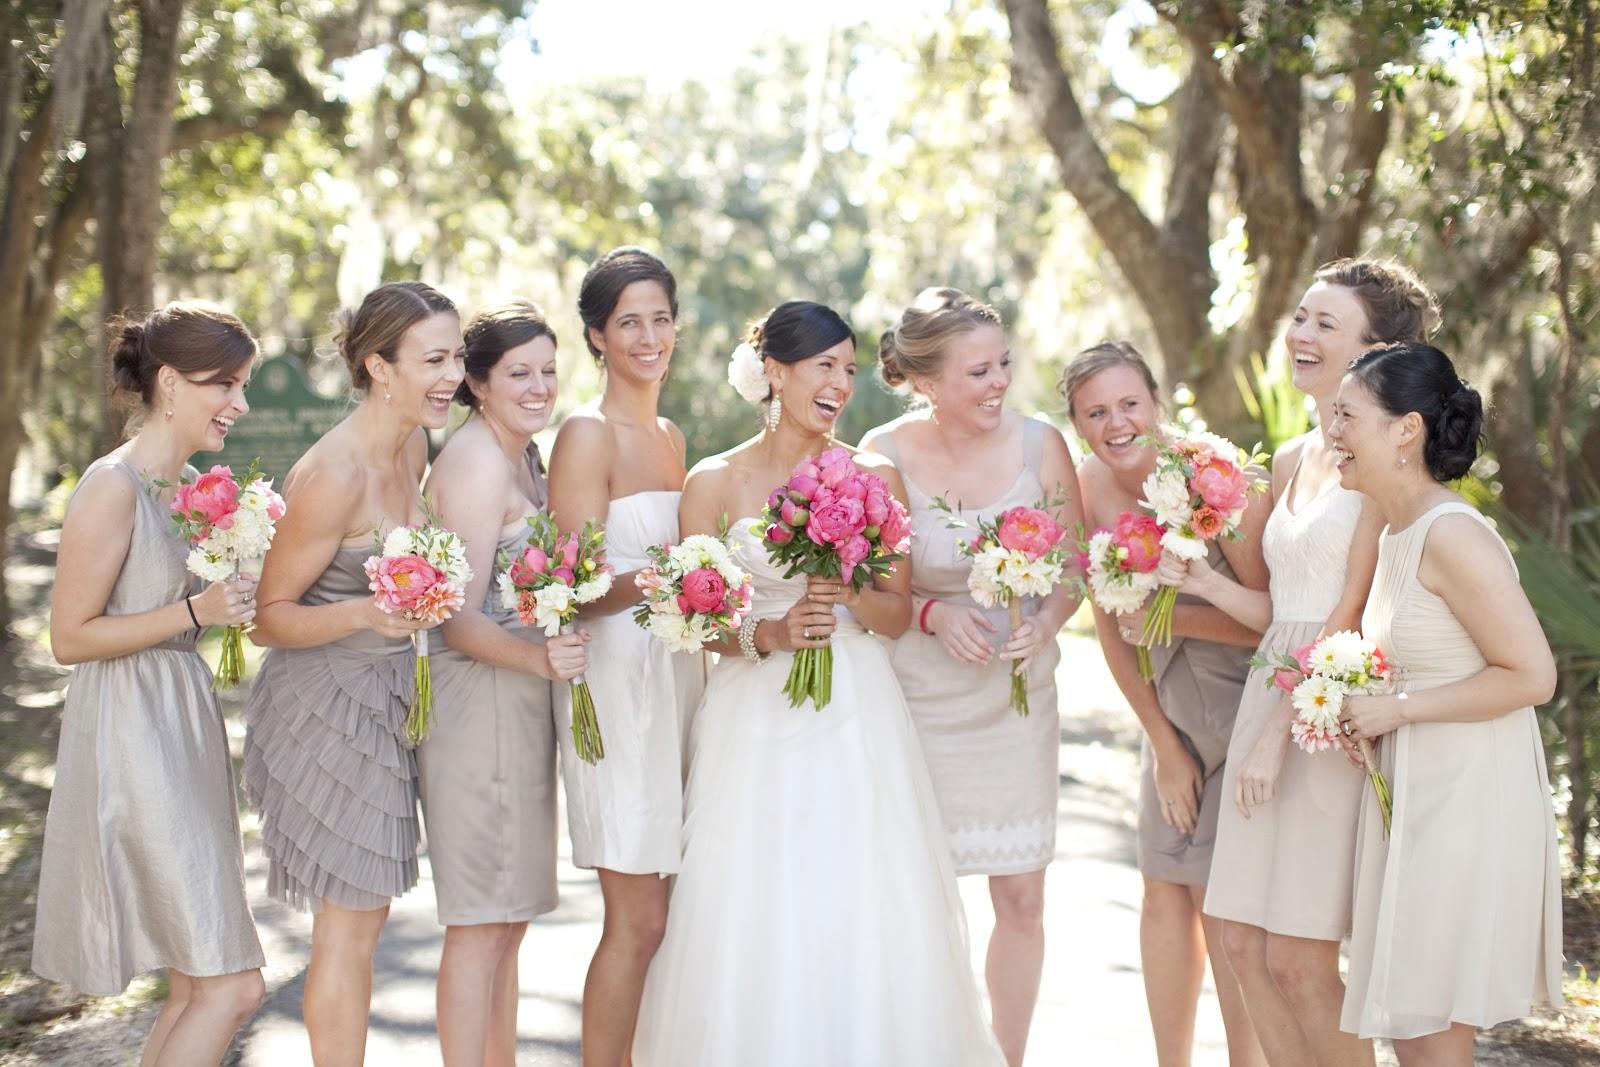 Bridesmaid Dresses In Neutrals Champagne Beige And Pale: Bald Head Island Club Weddings